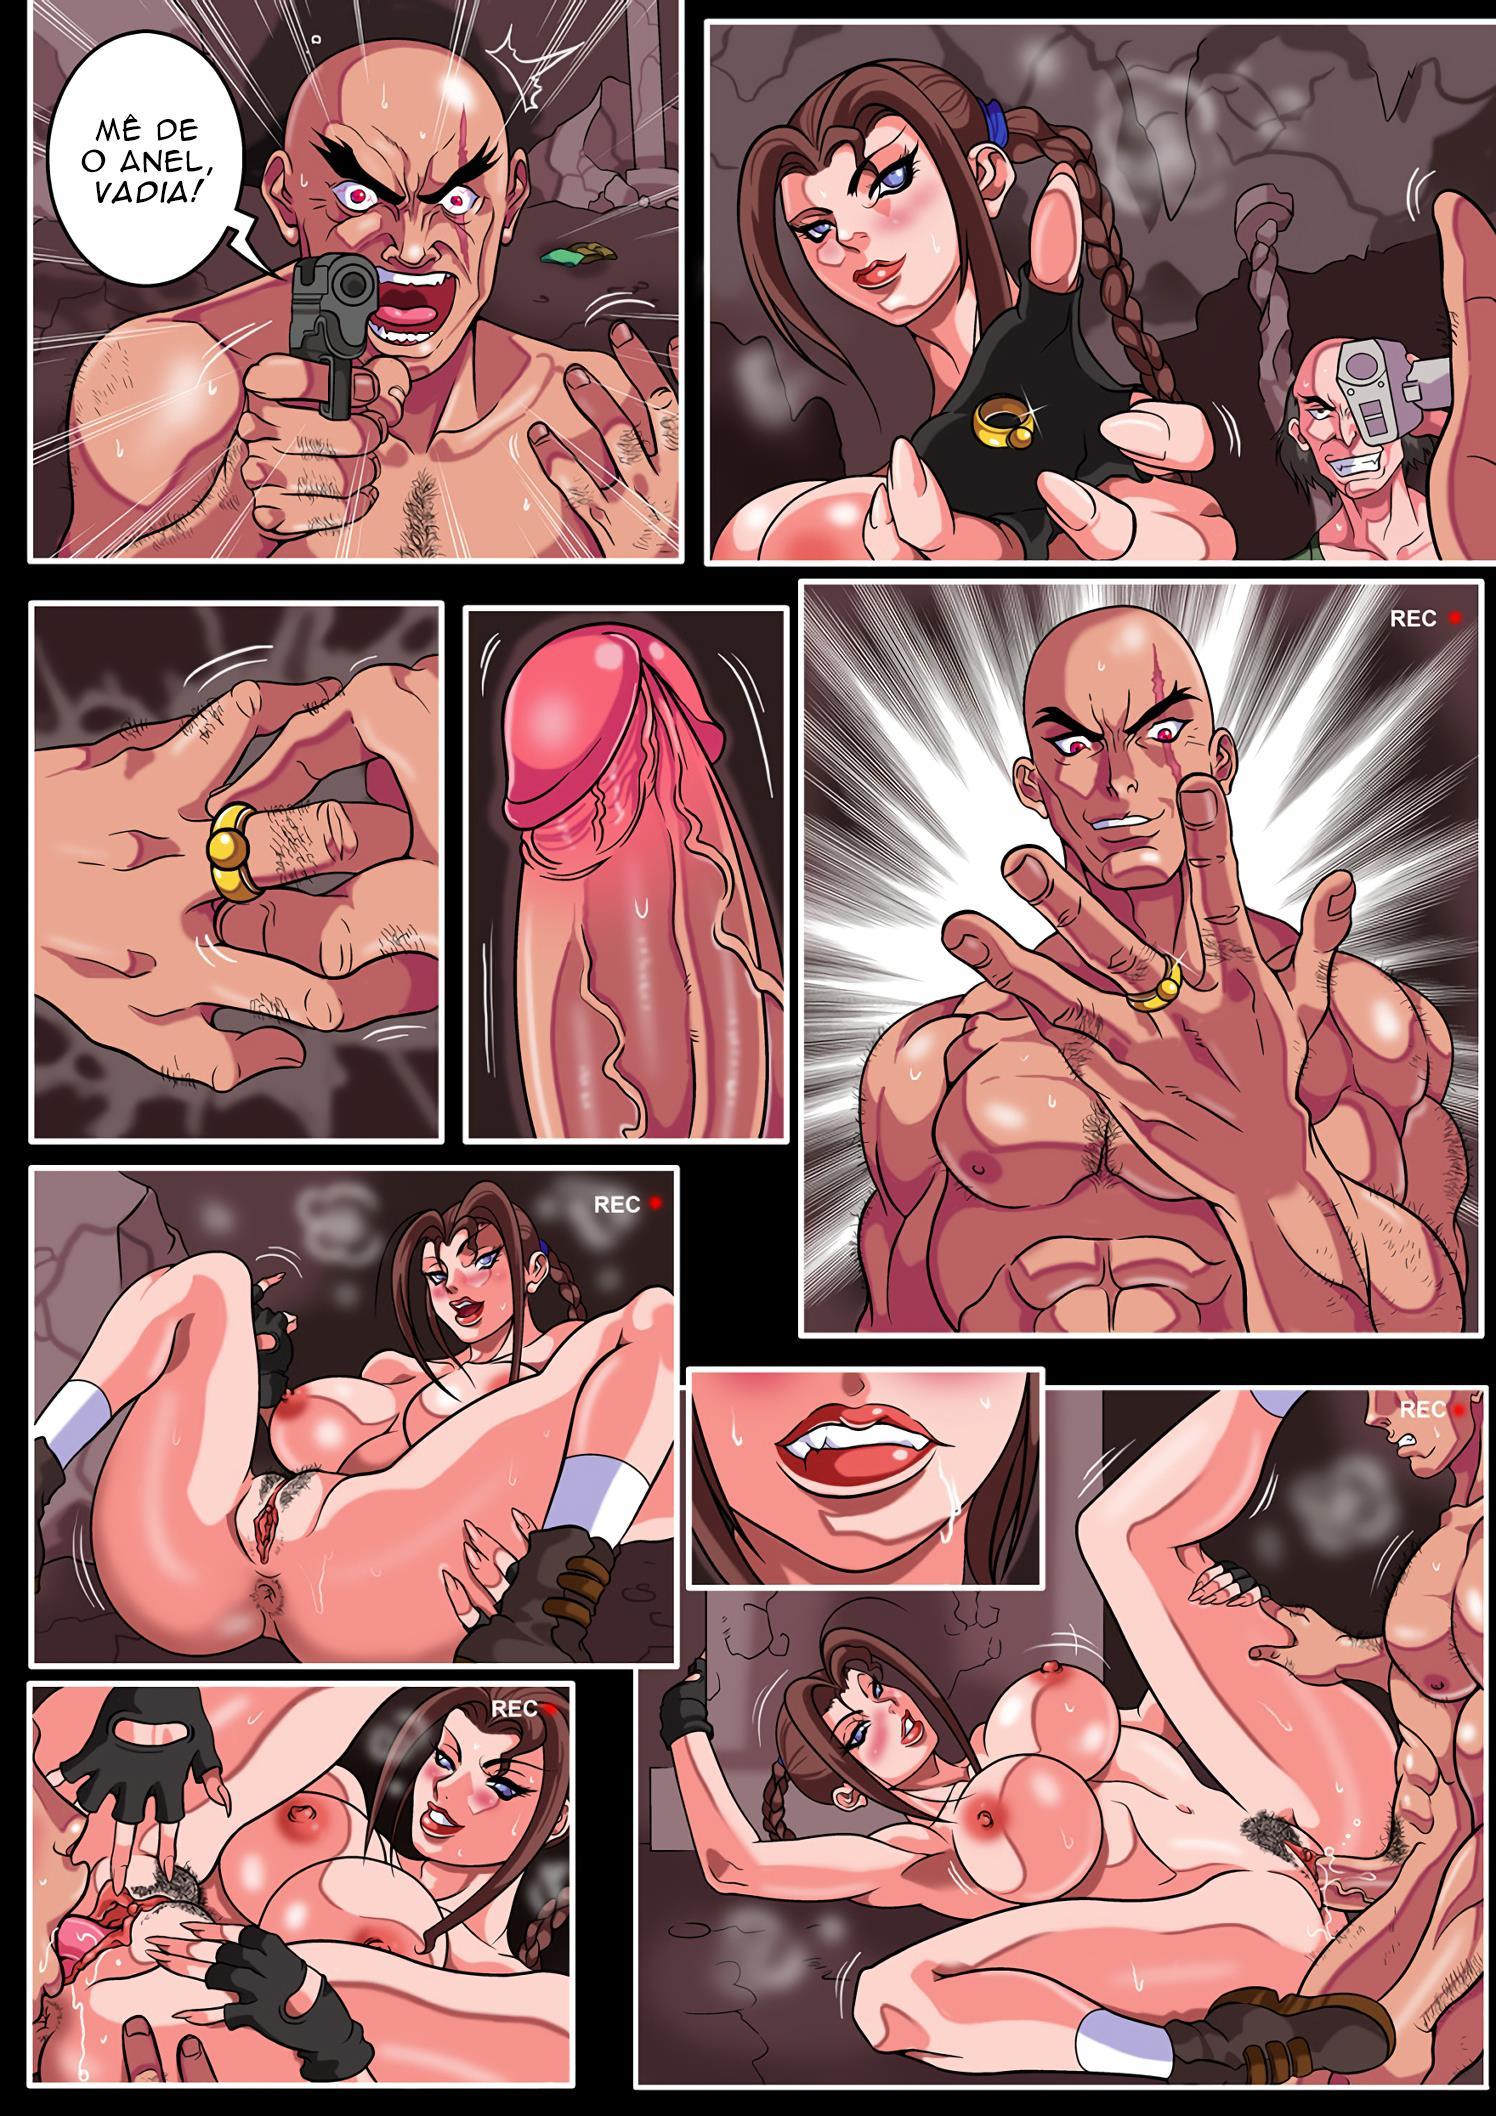 Tomb Raider Pornô – Lara à procura do anel peniano